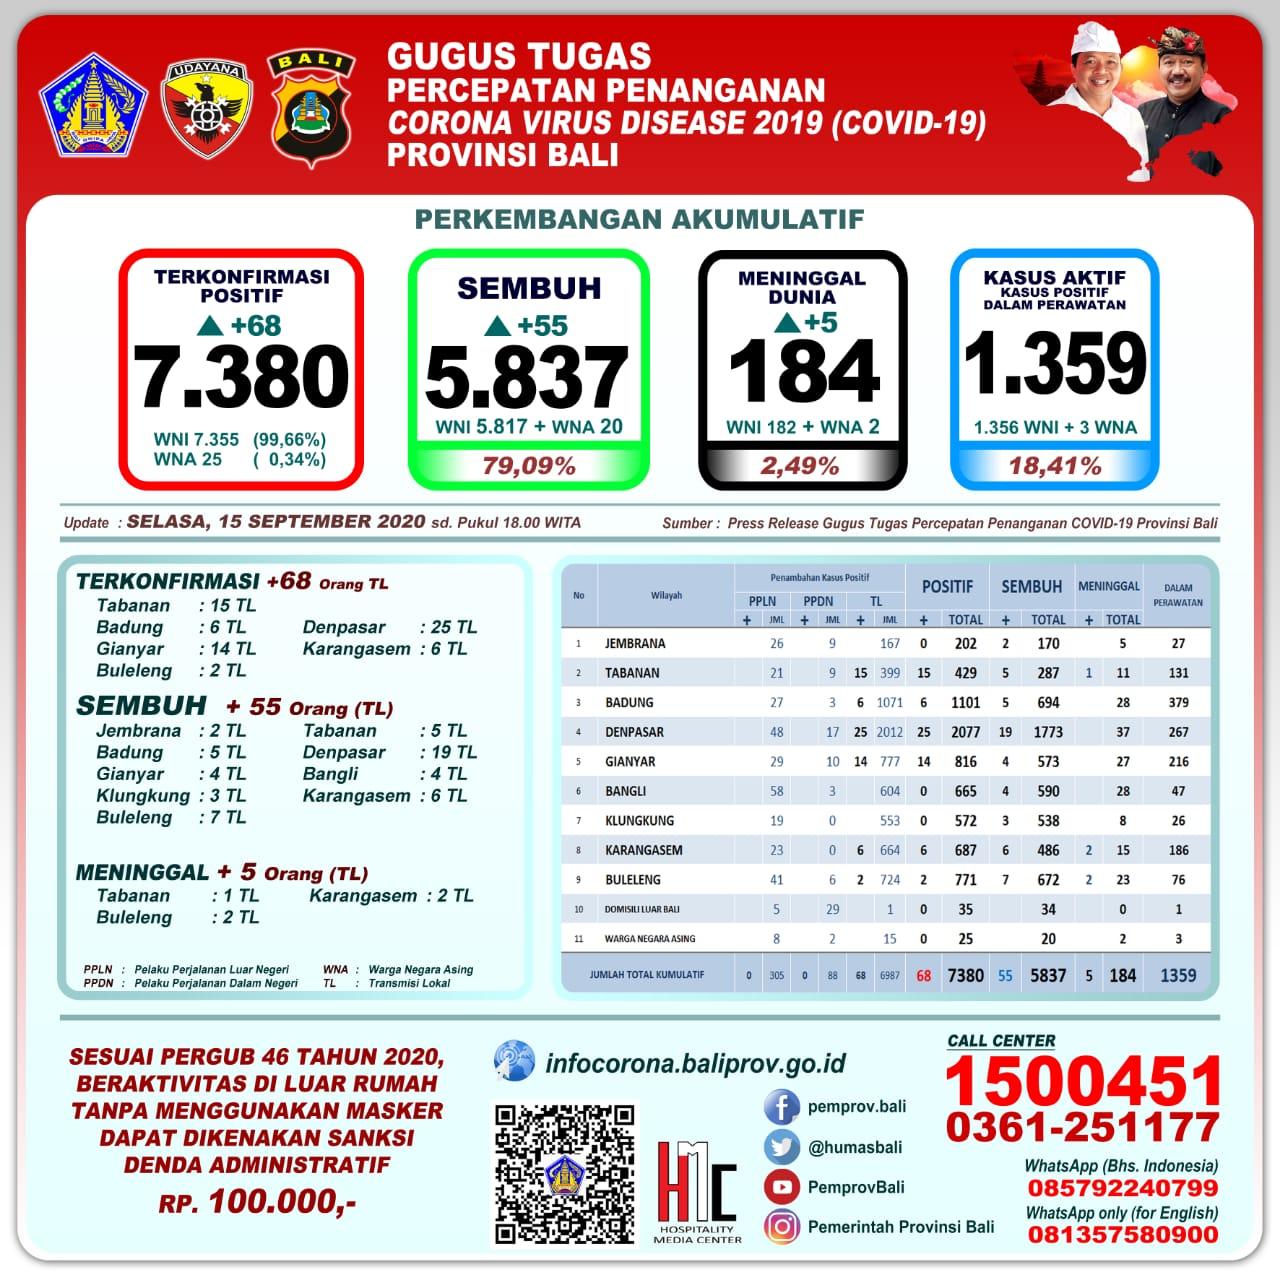 Perkembangan Terkini Kasus Covid Penambahan 68 55 Sembuh Dan 5 Orang Meninggal Redaksi9 Com